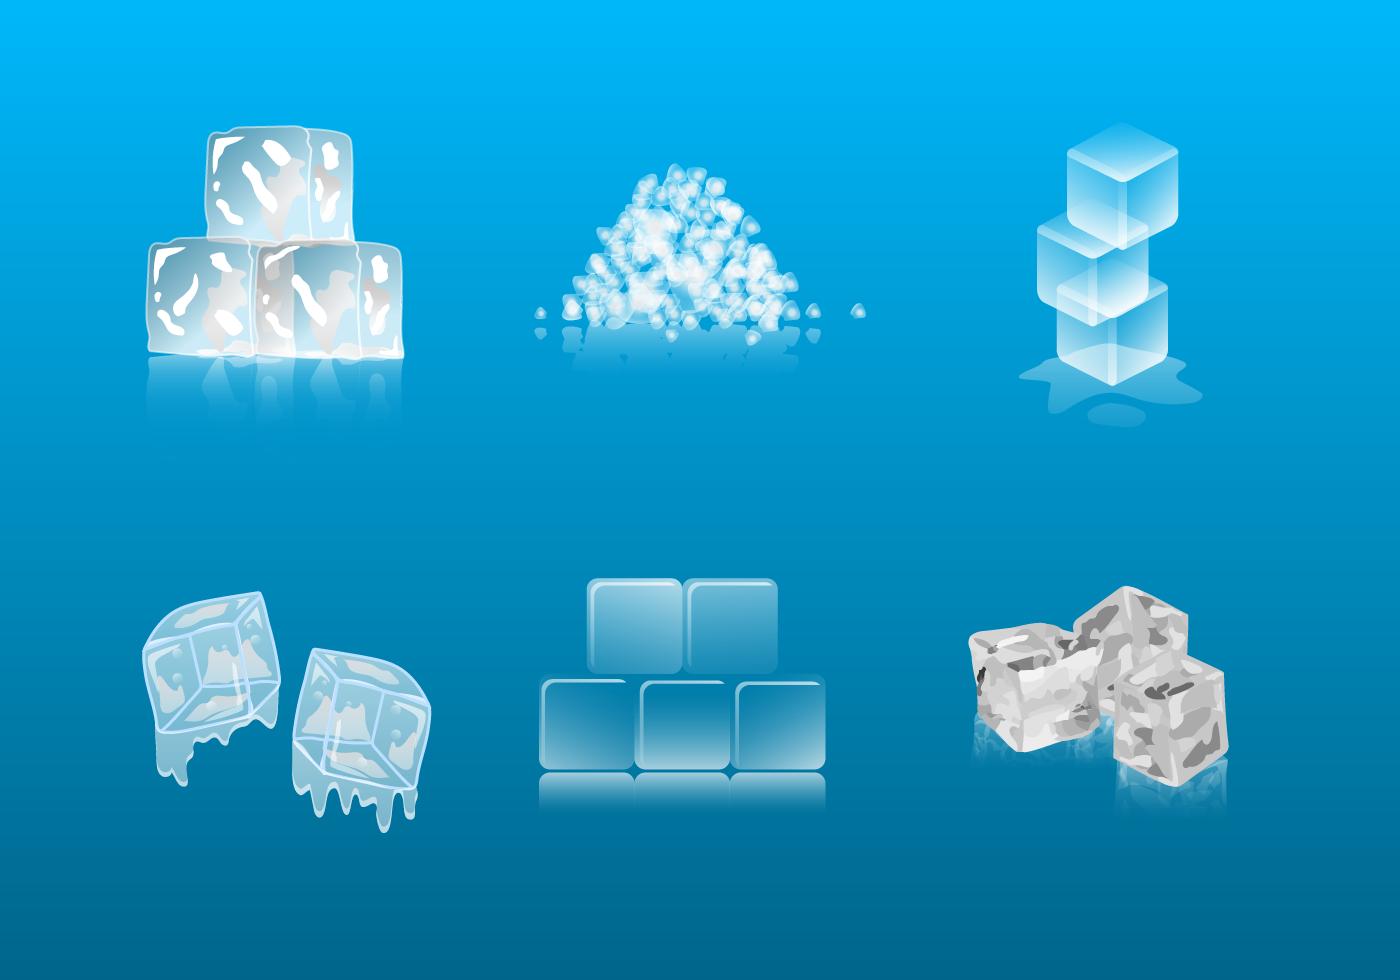 Crushed Ice Vectors - Download Free Vector Art, Stock Graphics ...